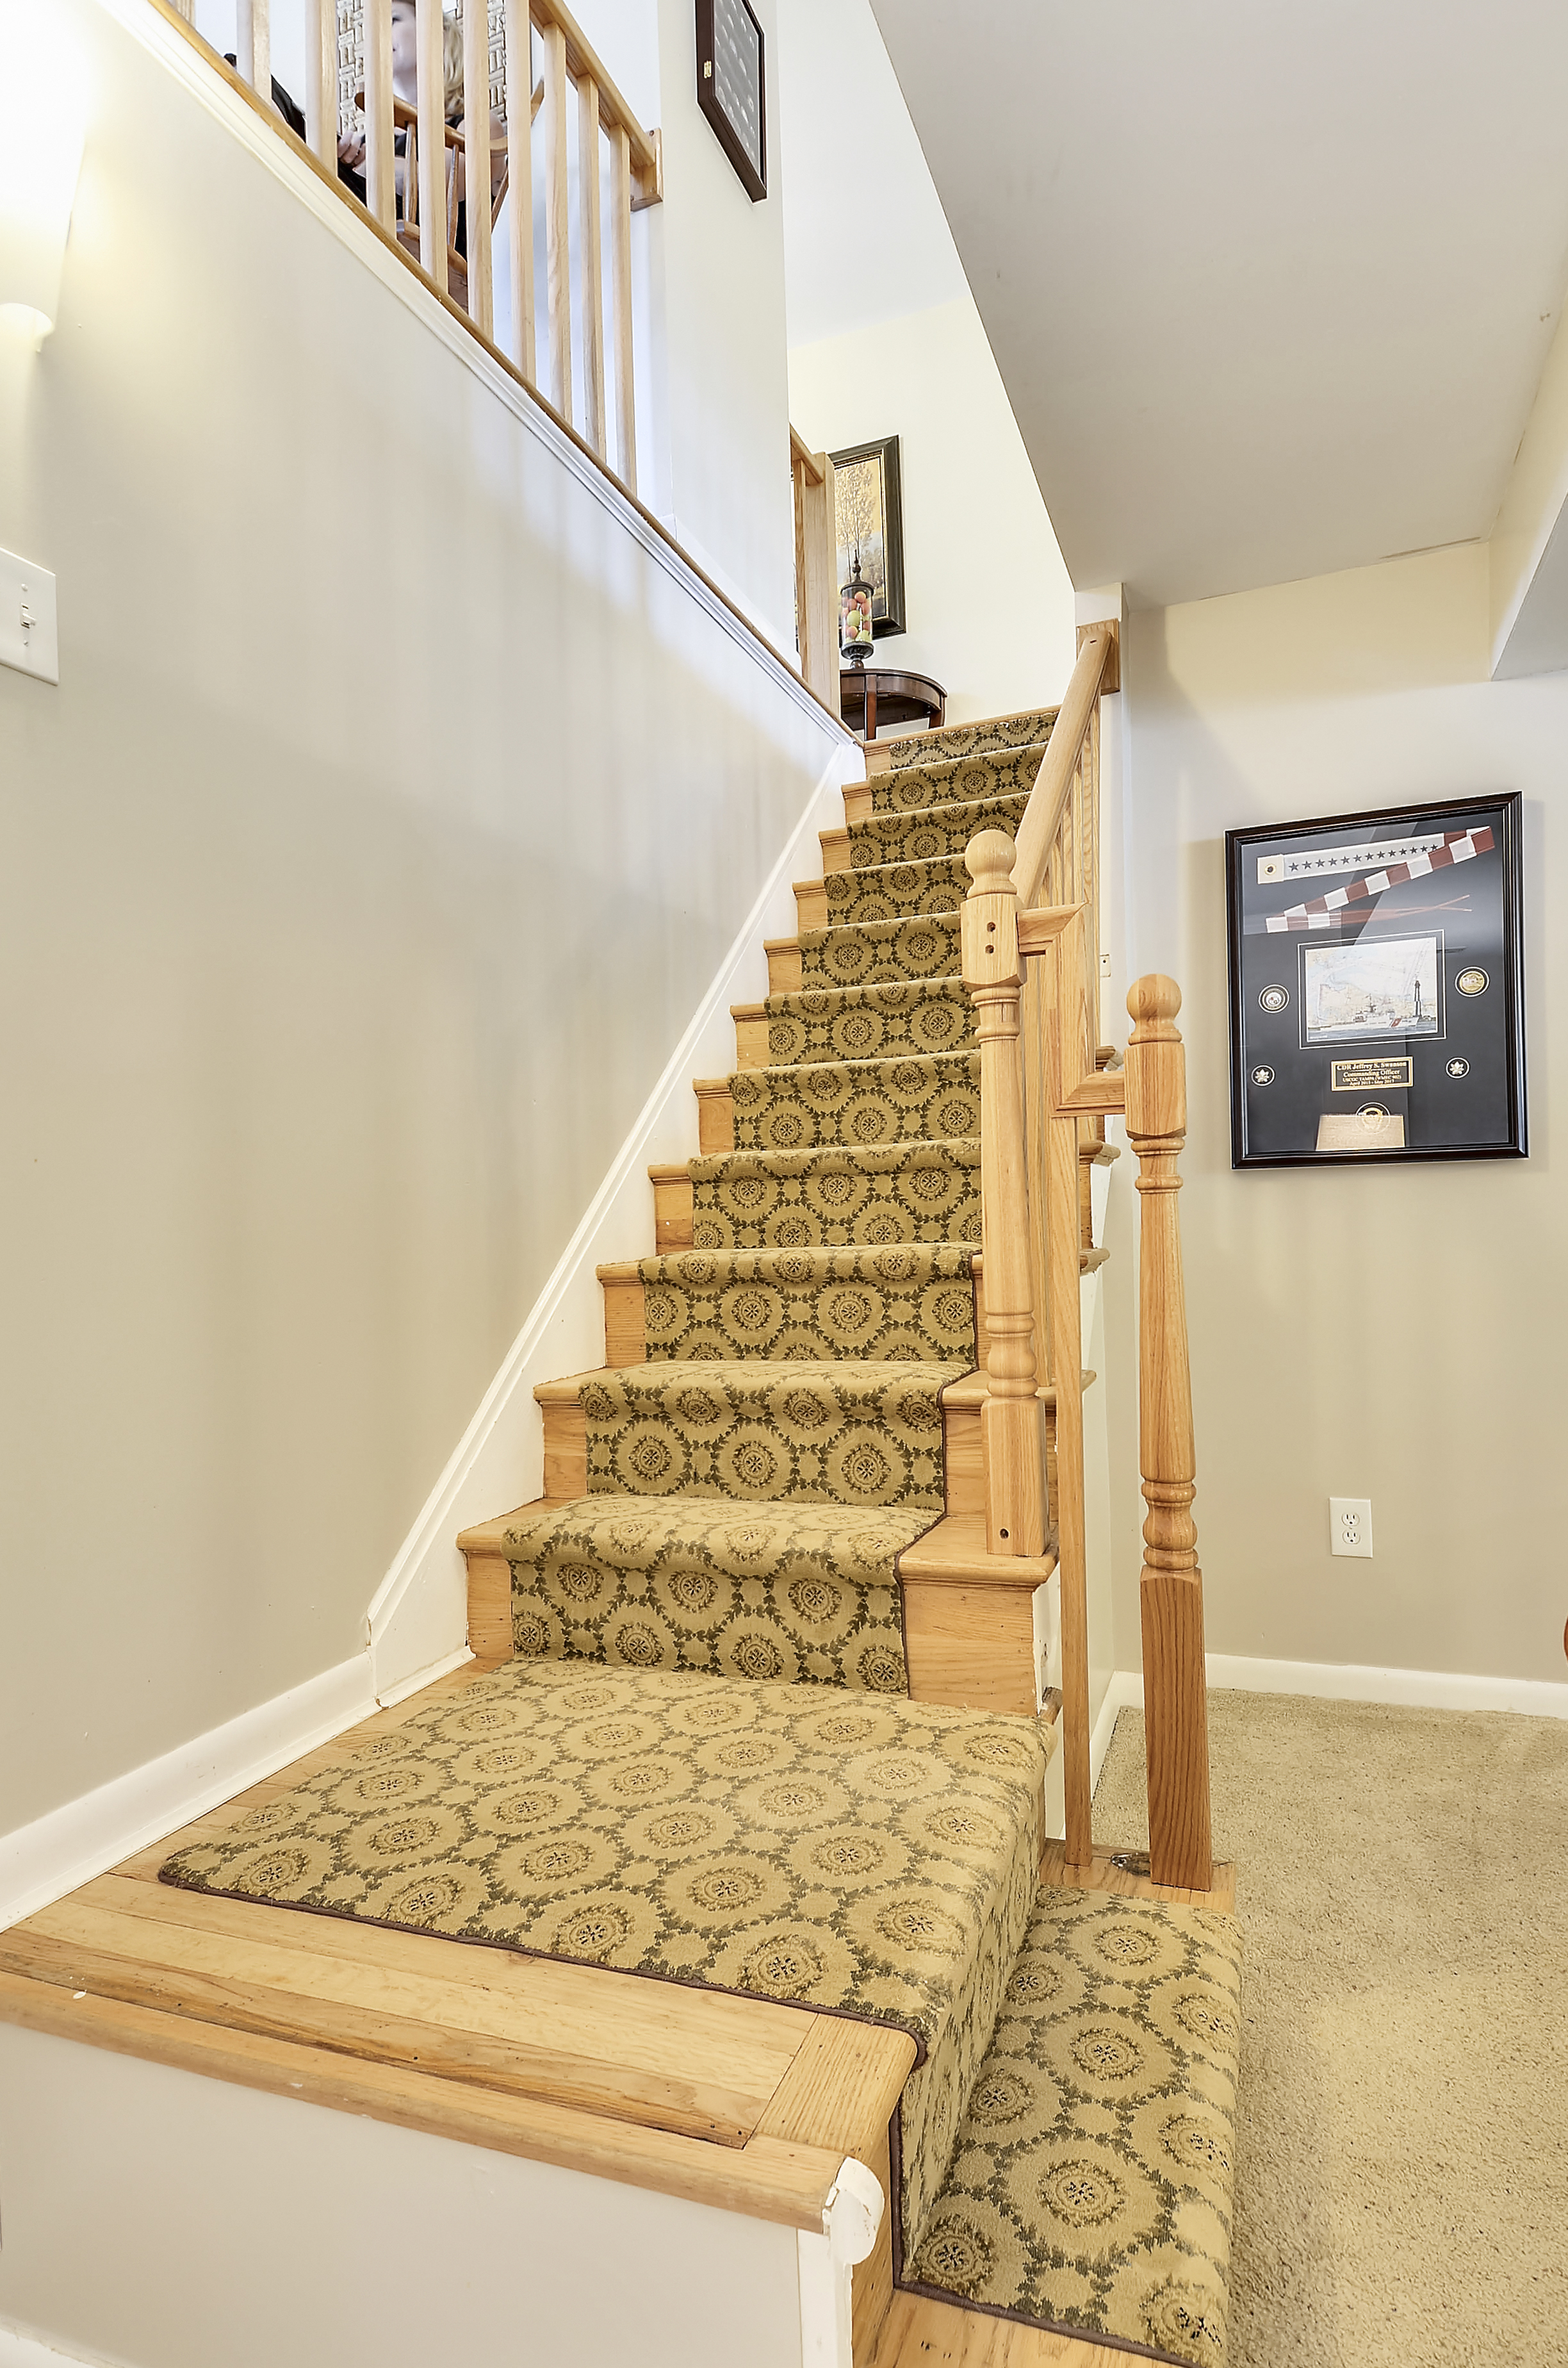 Lower Level-Stairs-_DSC5555.JPG